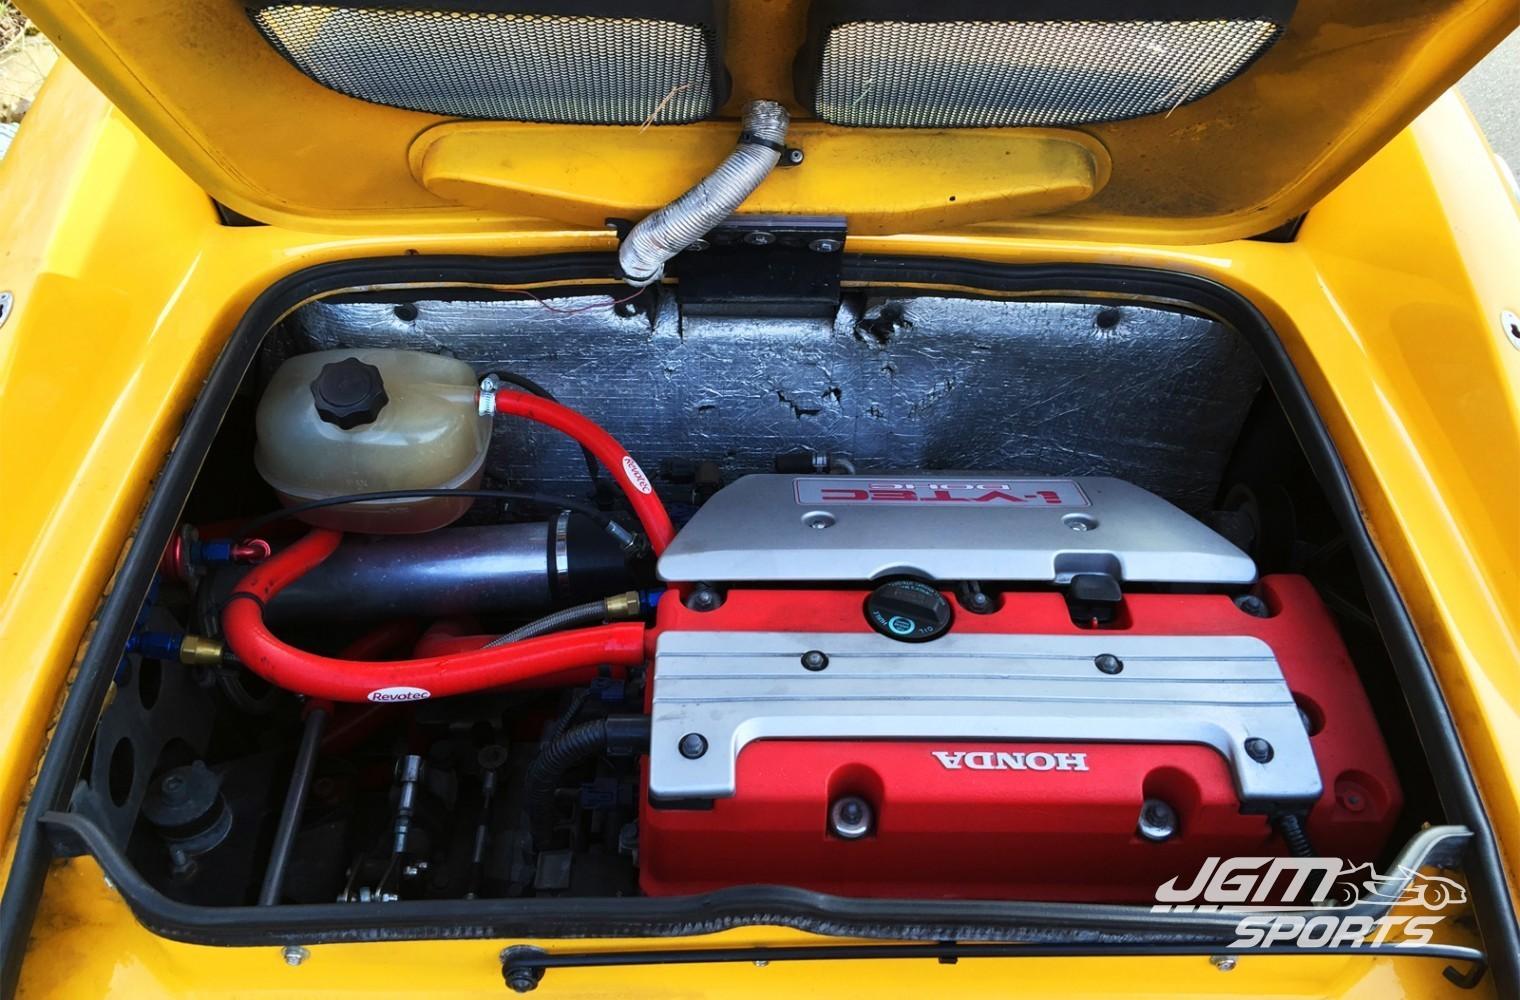 1999 S1 LOTUS ELISE ESSEX AUTOSPORT HONDA CONVERSION 220BHP! › JGMsports